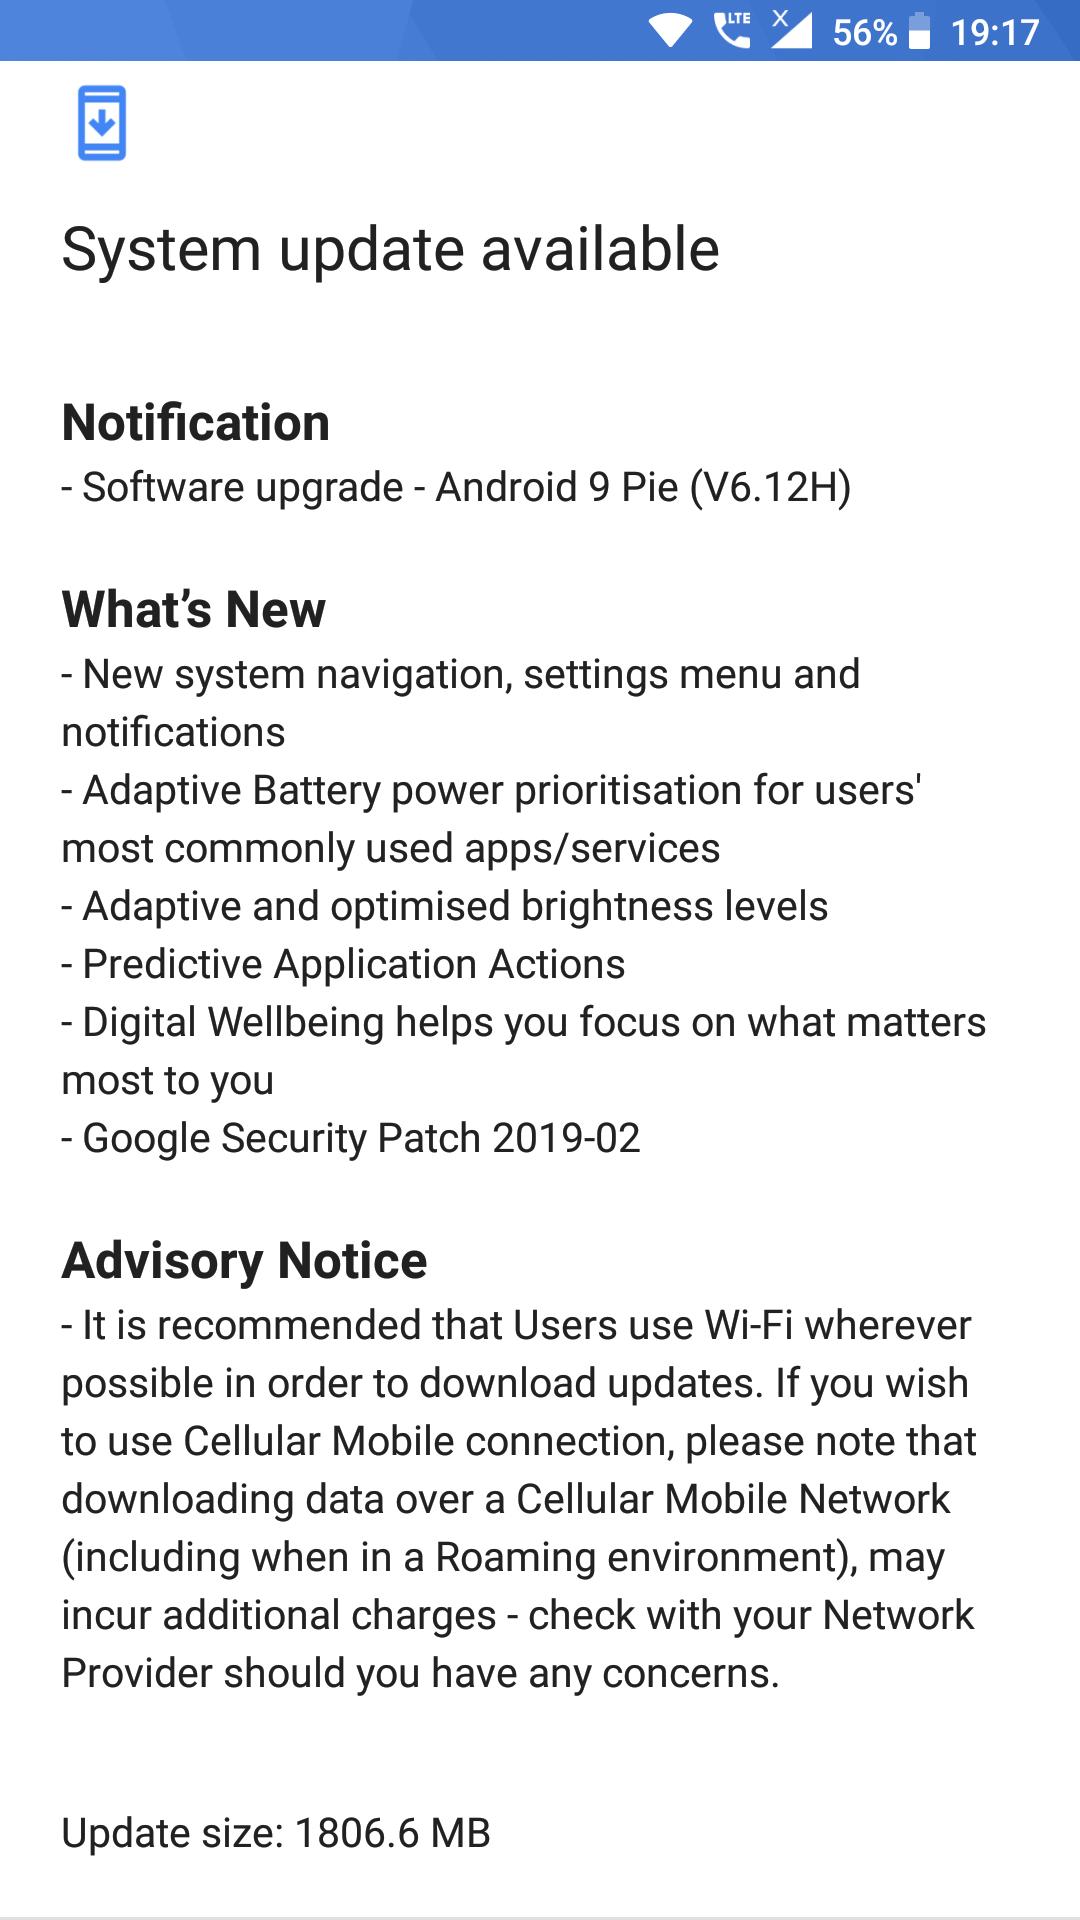 Android Pie Finally For Nokia 6(TA-1021) — Nokia phones